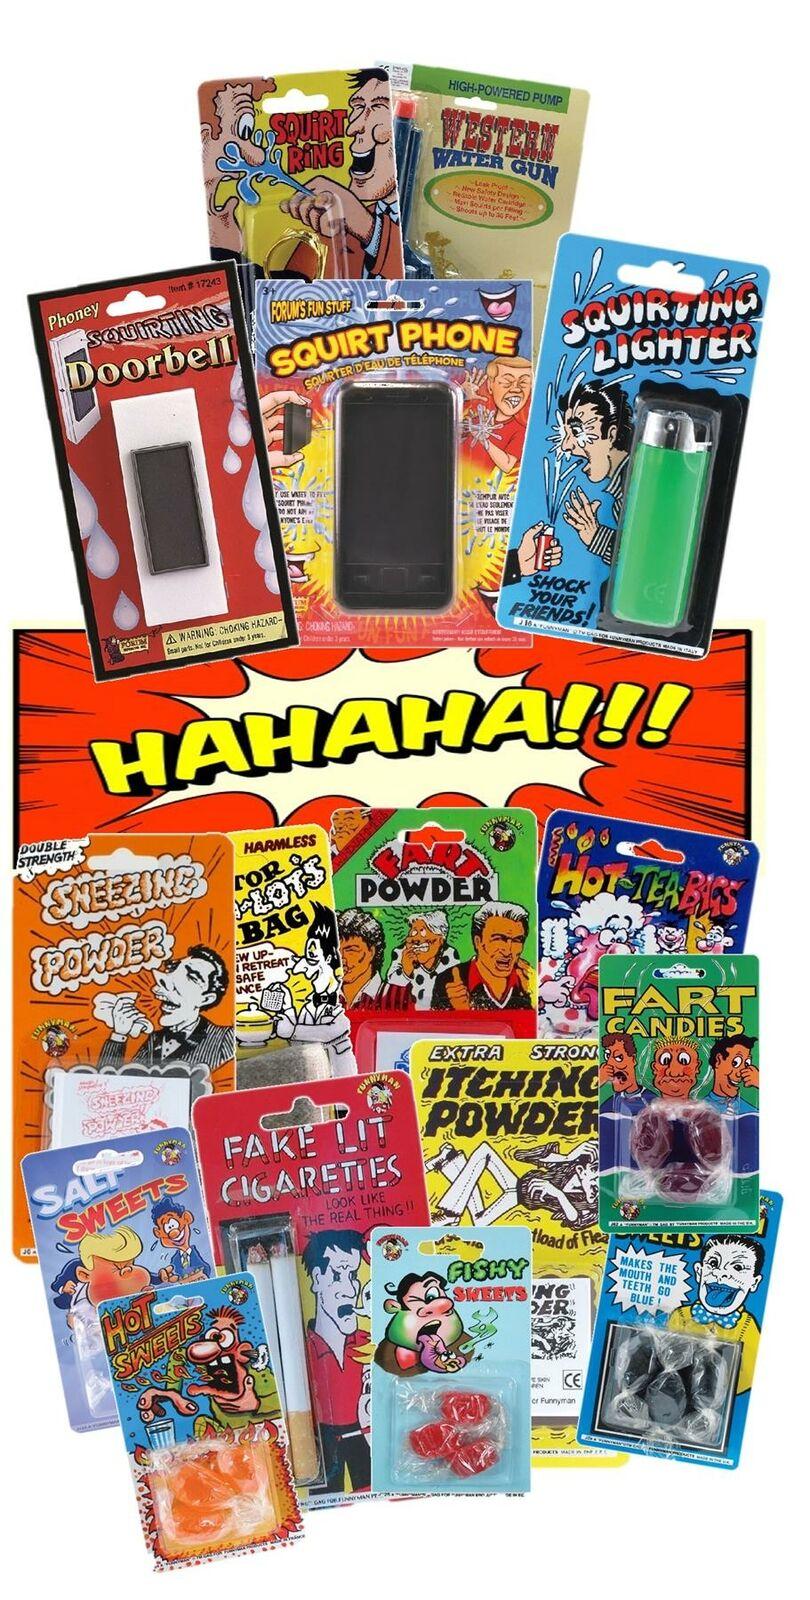 Shock Pen Joke childrens funny party bag gift comedy comedian amusing rude!